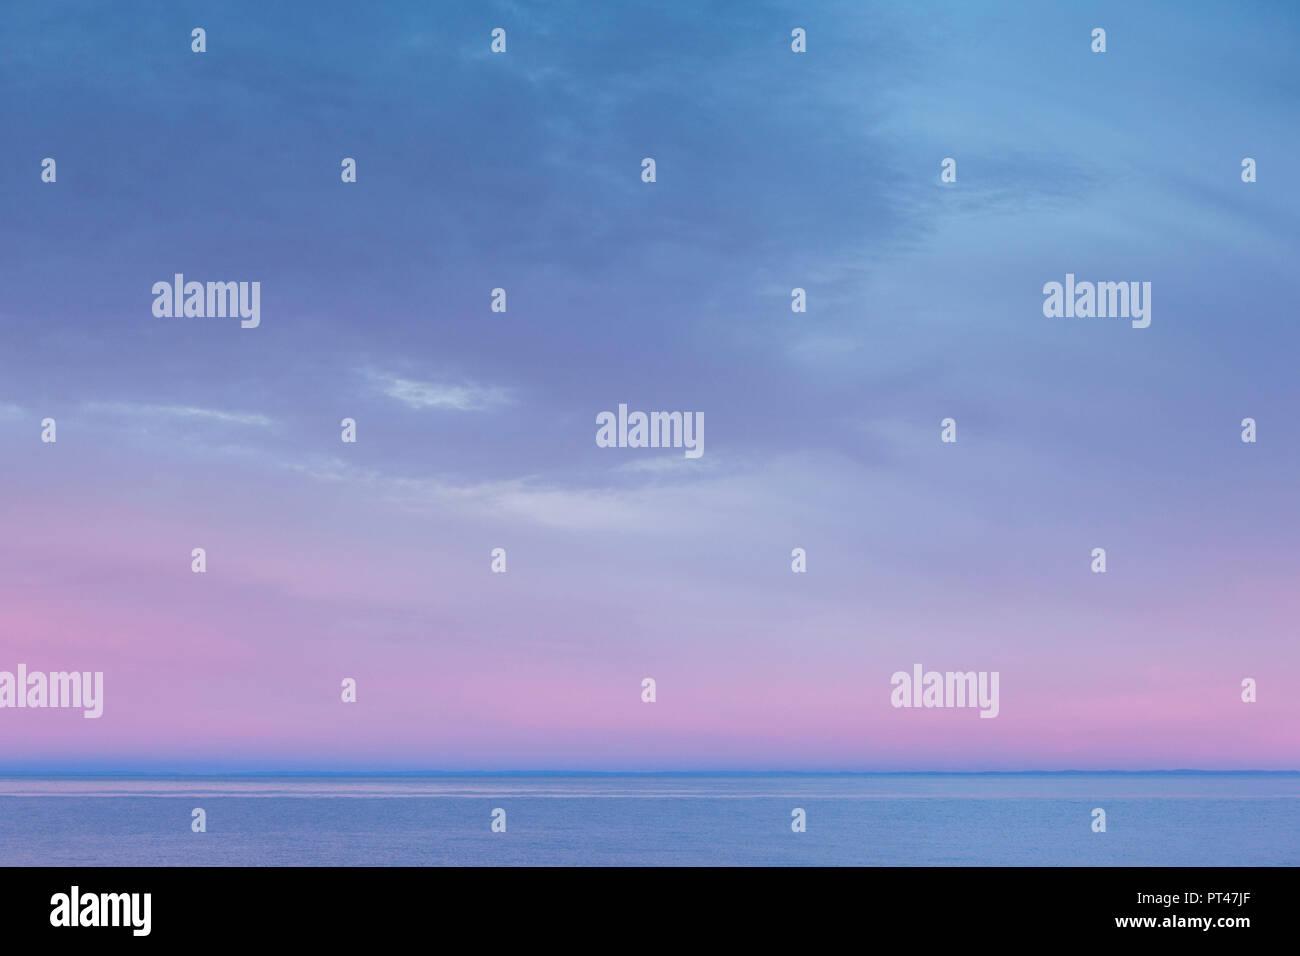 Canada, Quebec, Gaspe Peninsula, Sainte-Flavie, St. Lawrence River, motion-blur, dawn - Stock Image